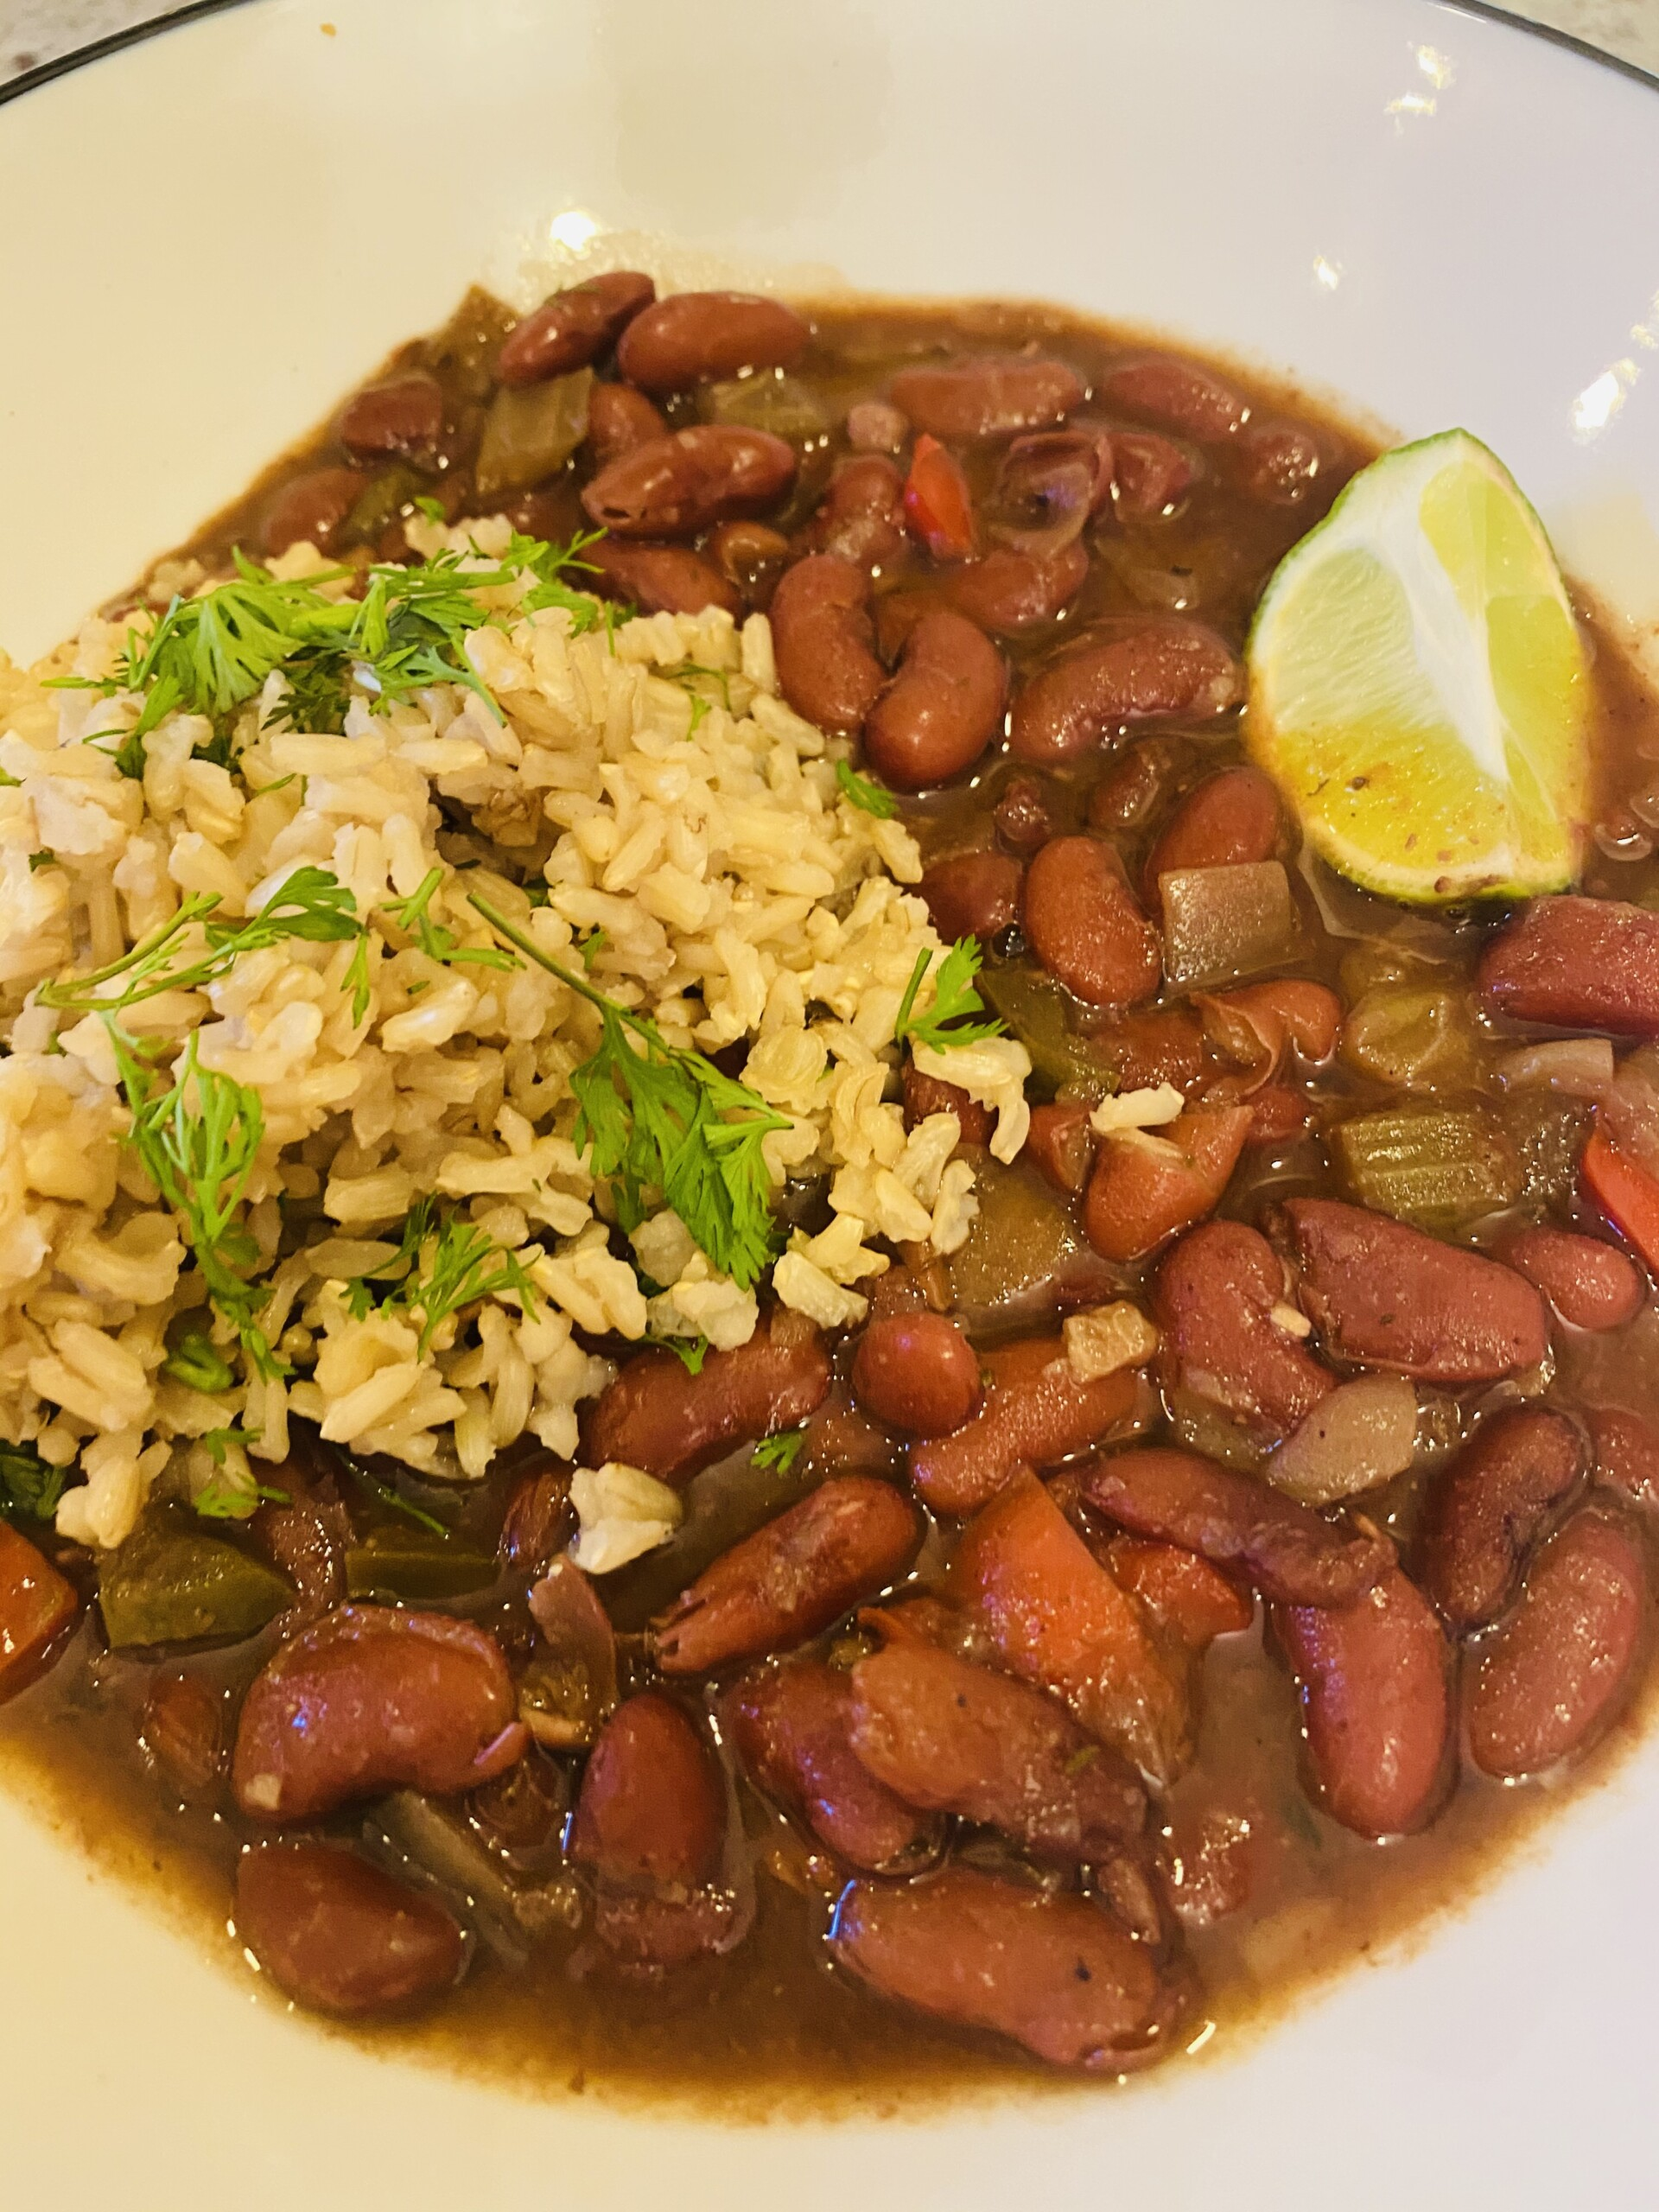 Vegan Cajun Red Beans & Rice for Instant Pot or stovetop*